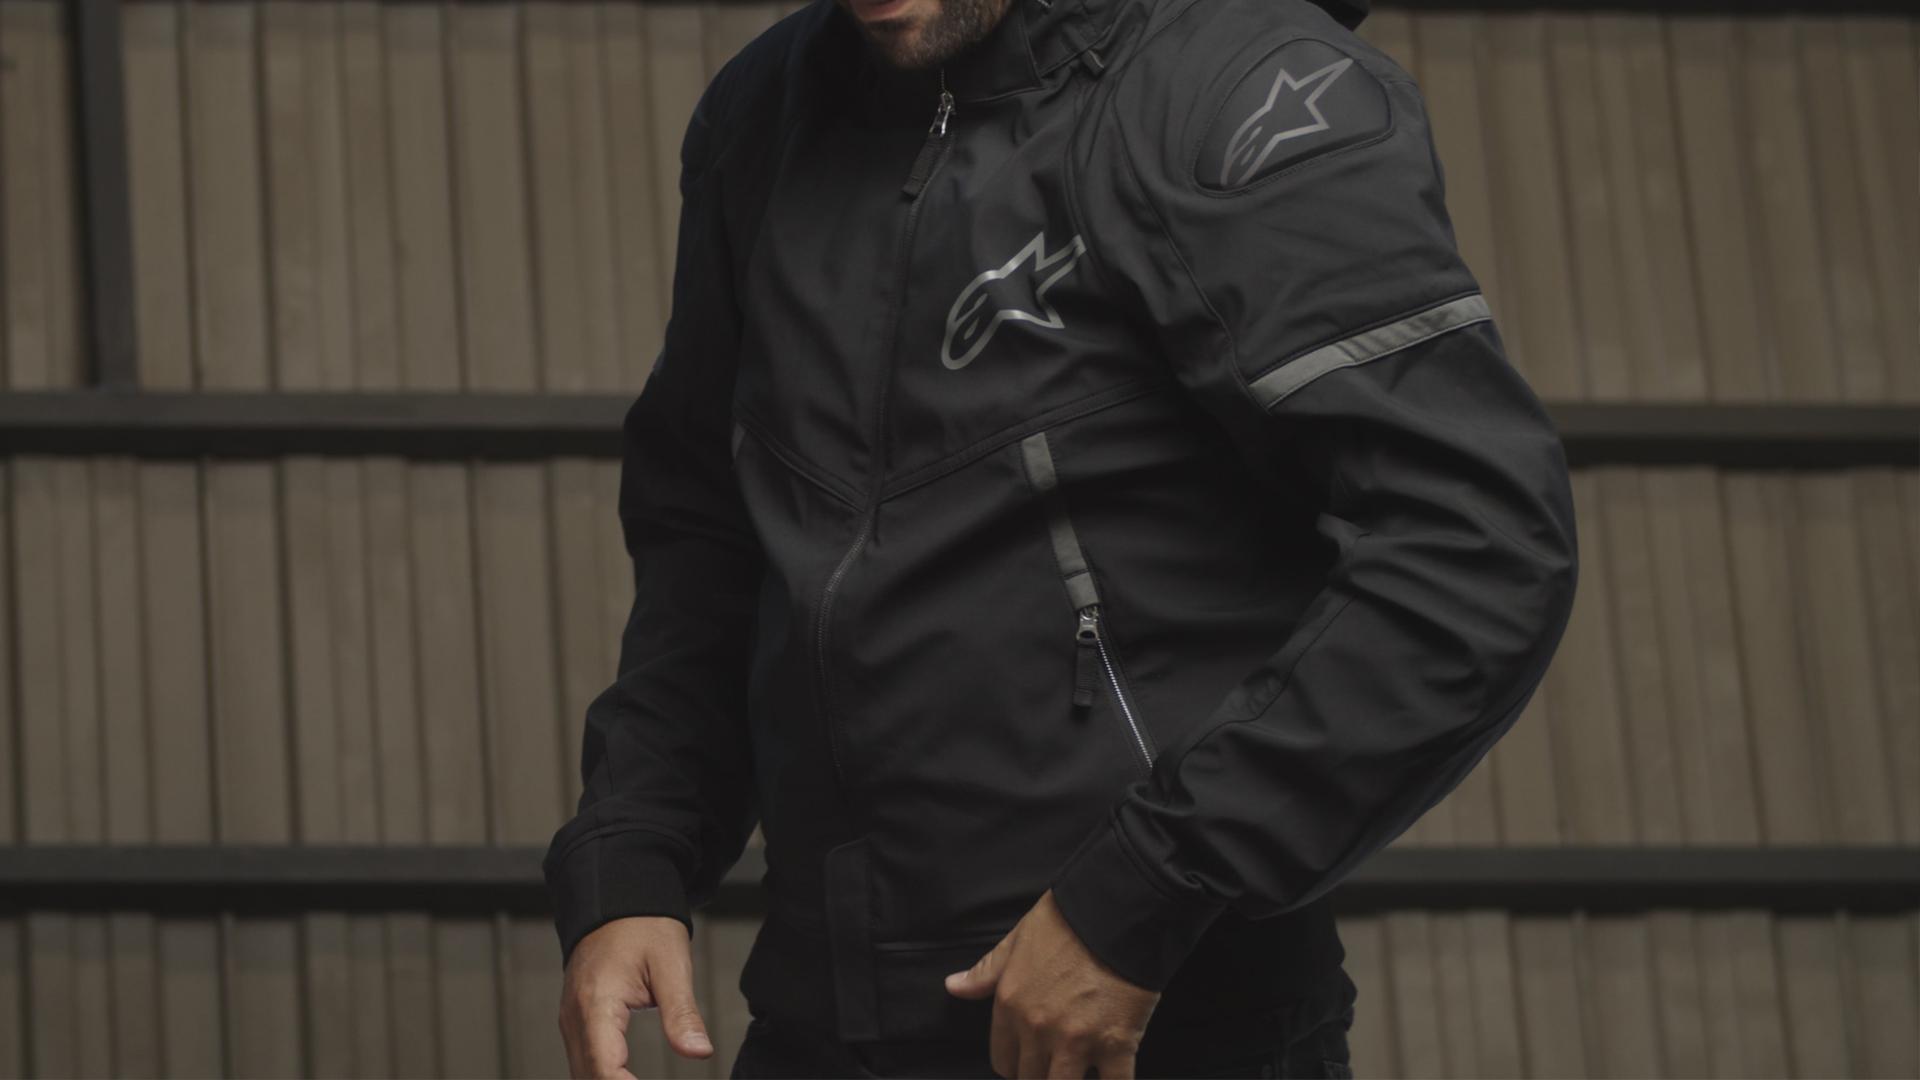 Alpinestars Sektor v2 motorcycle jacket